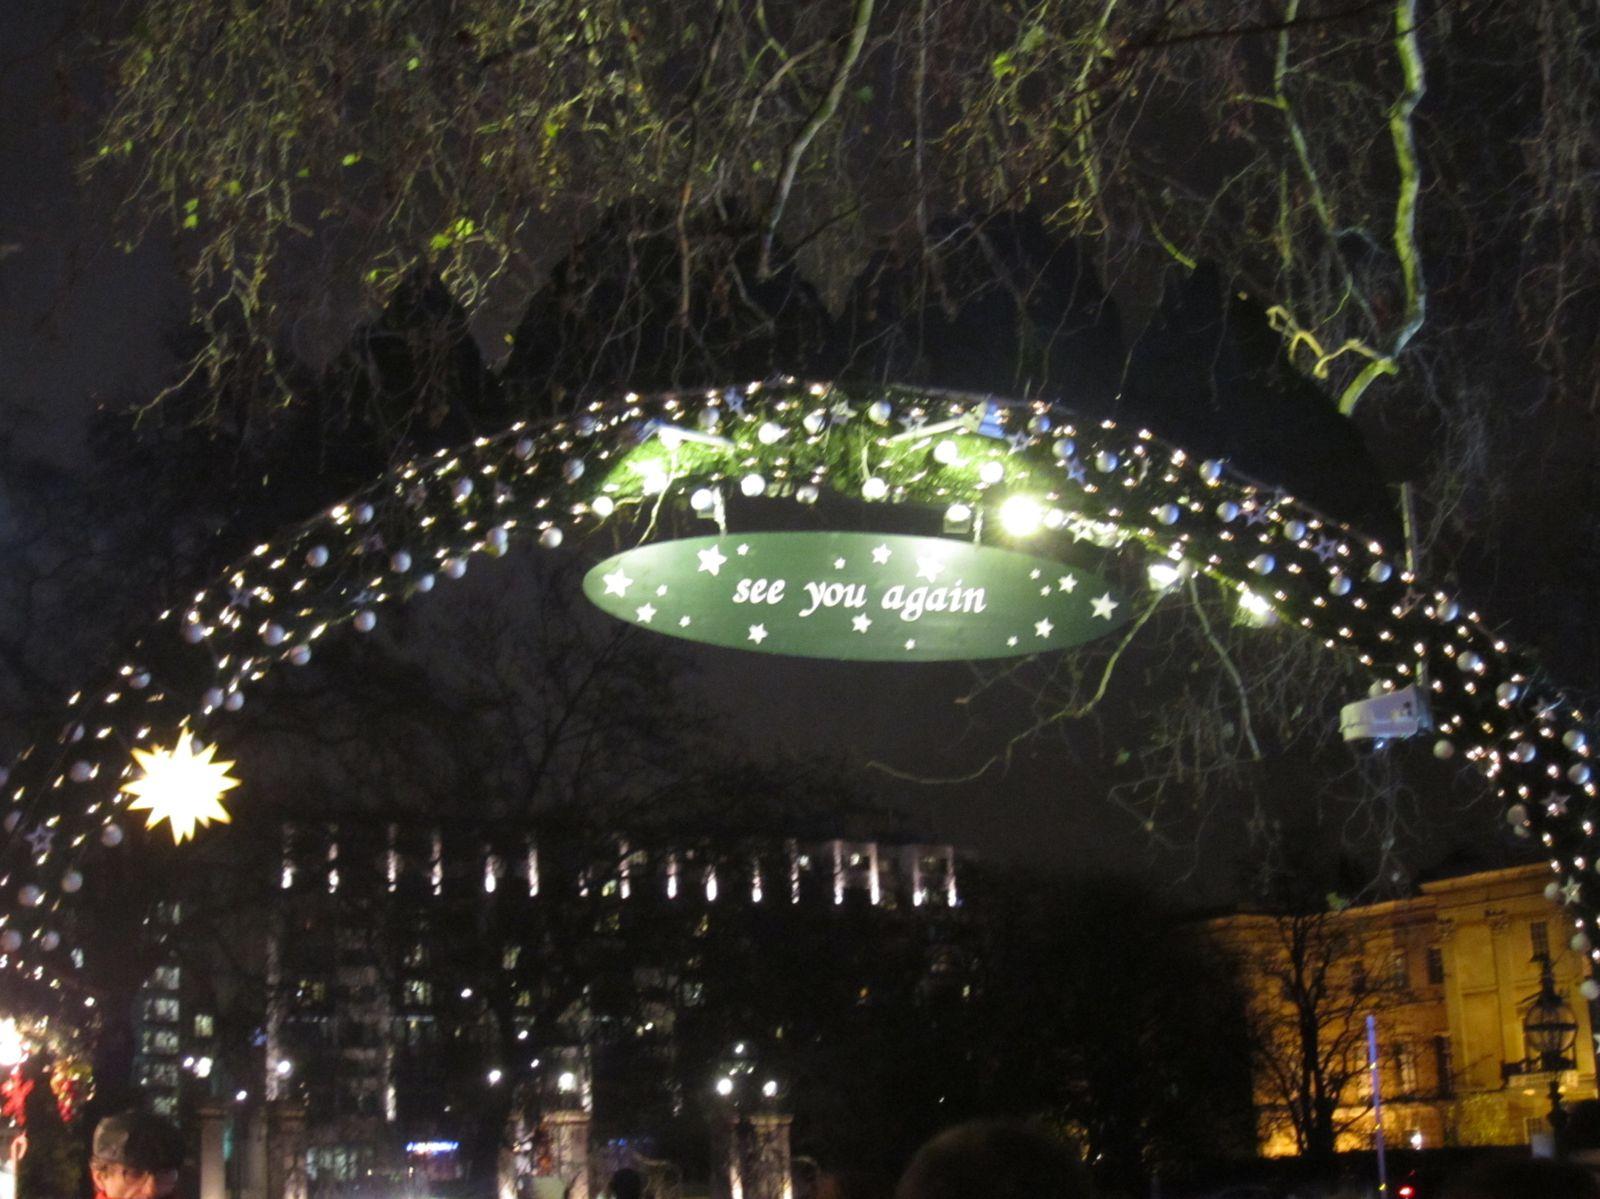 London for Christmas, actually.